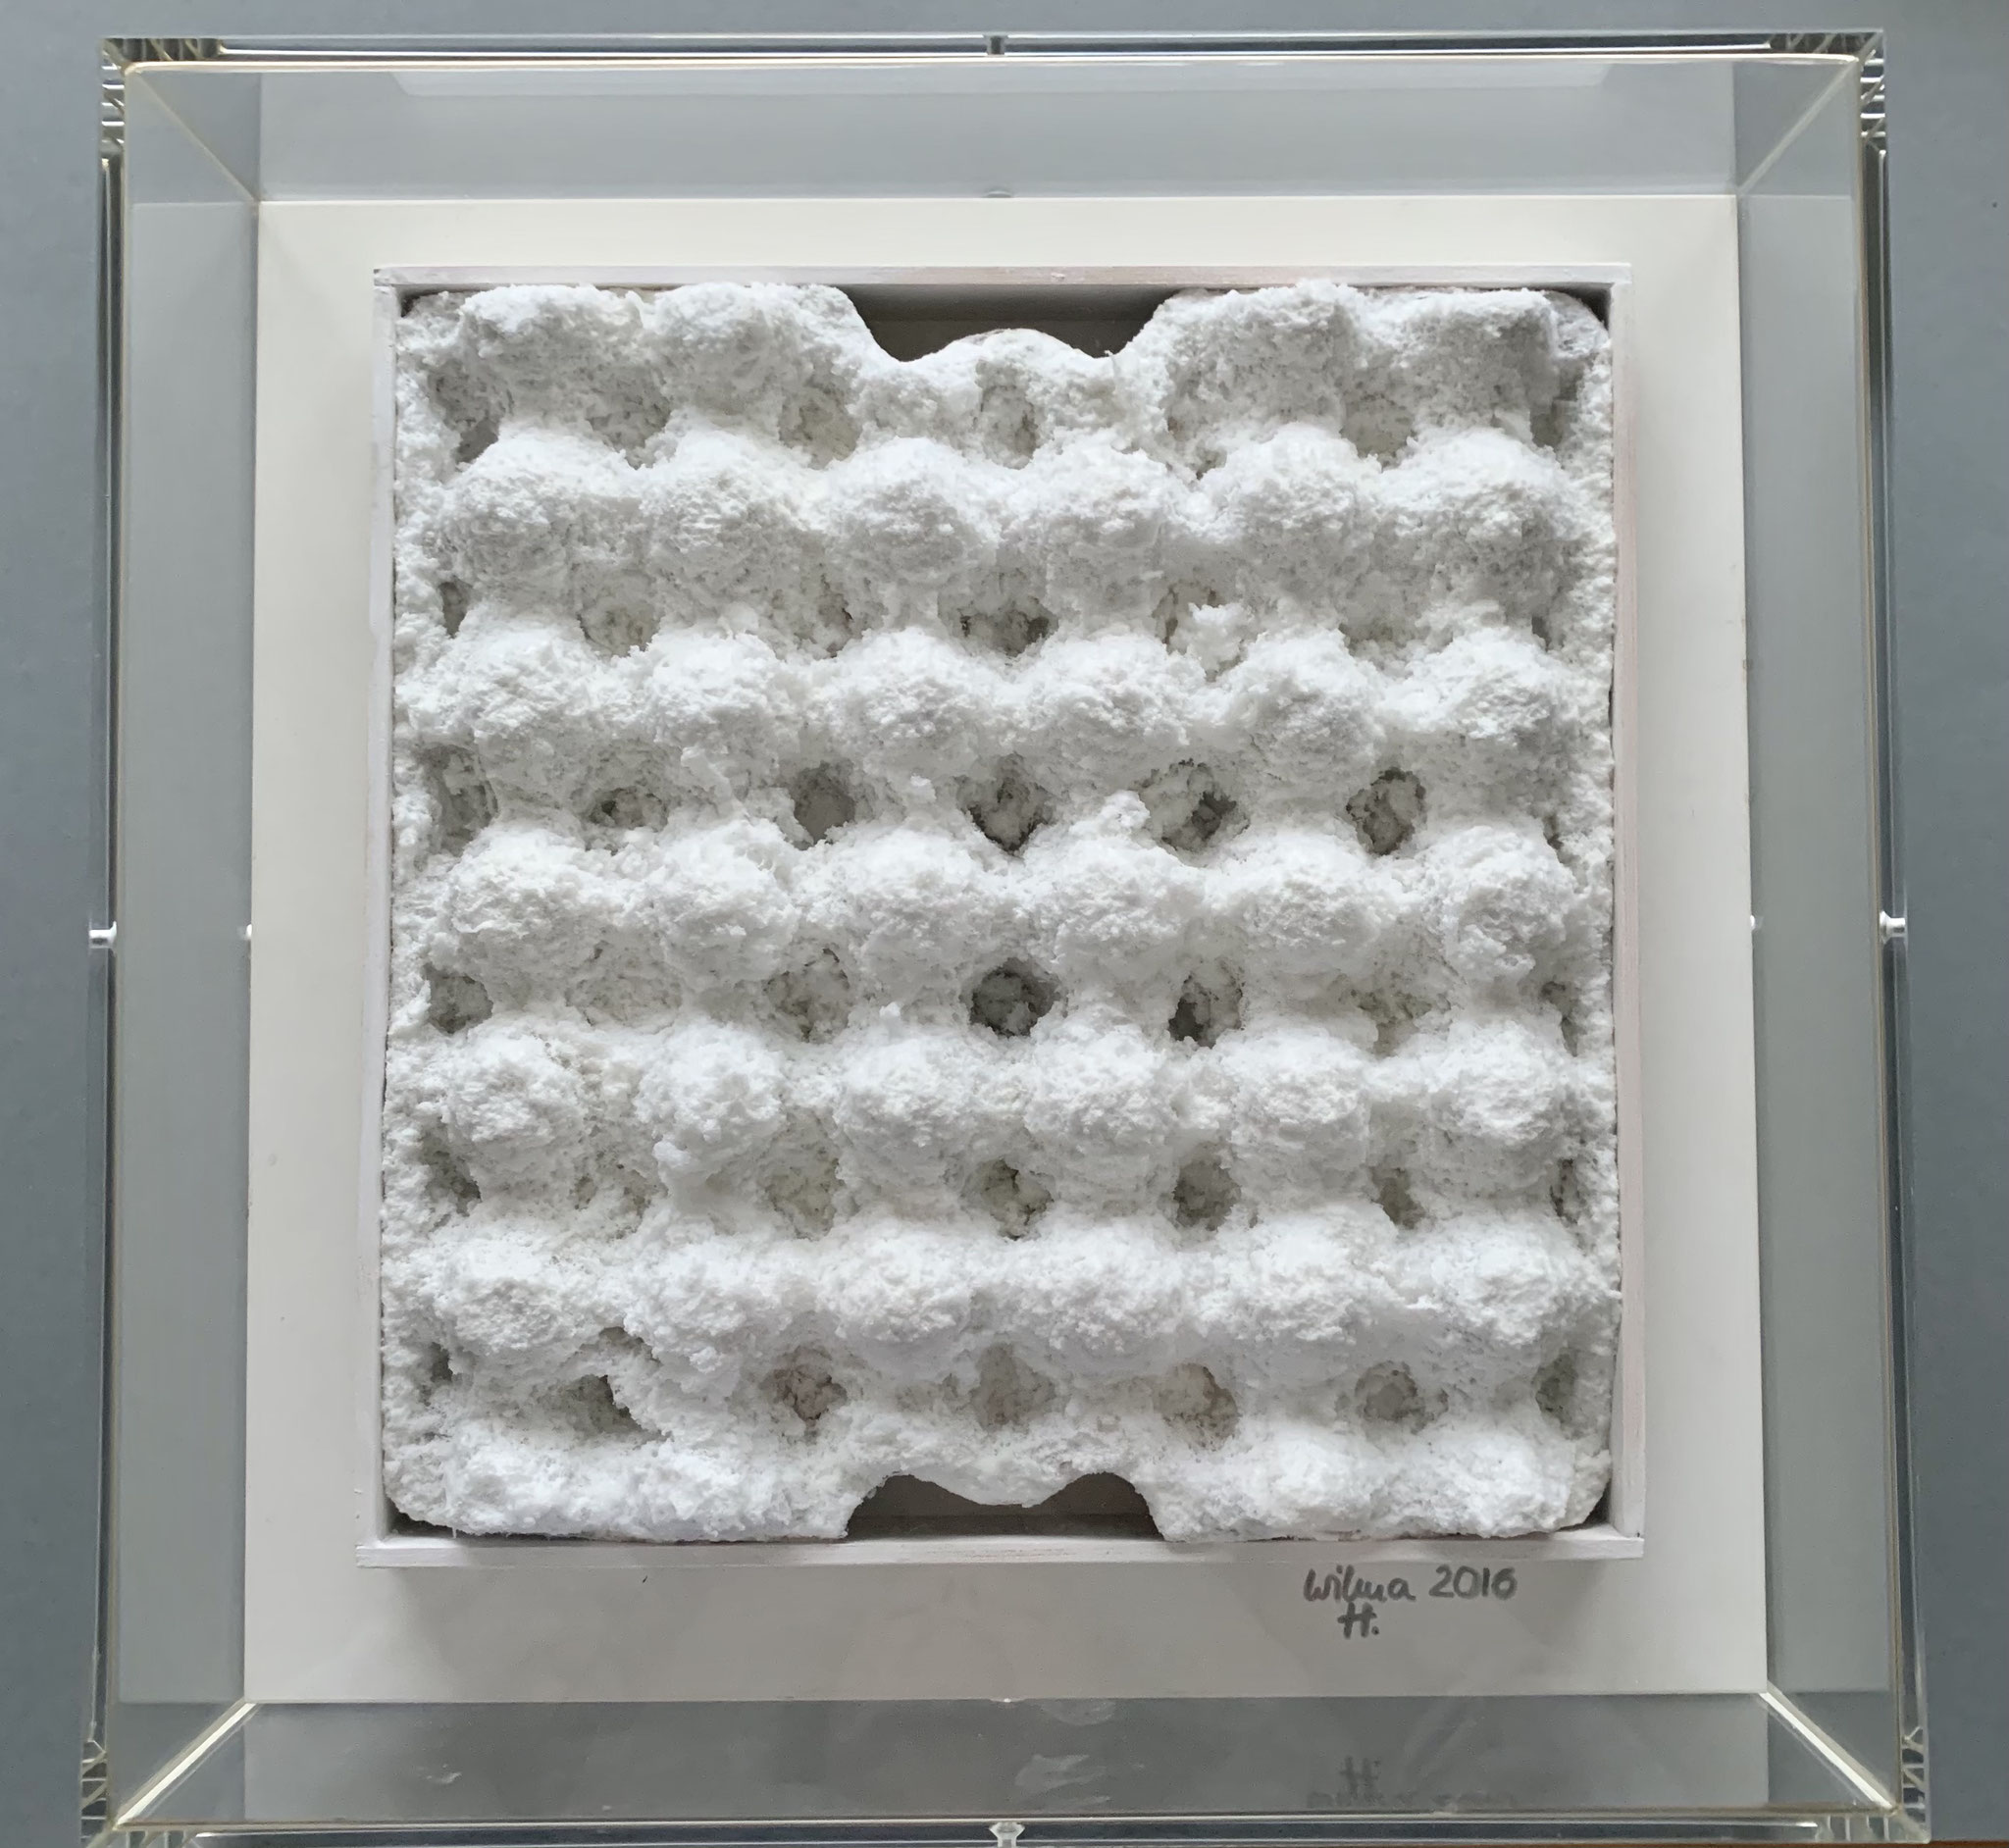 kissen1 | cellulose a karton | 32x32cm acrylkasten 40x40cm | 2016